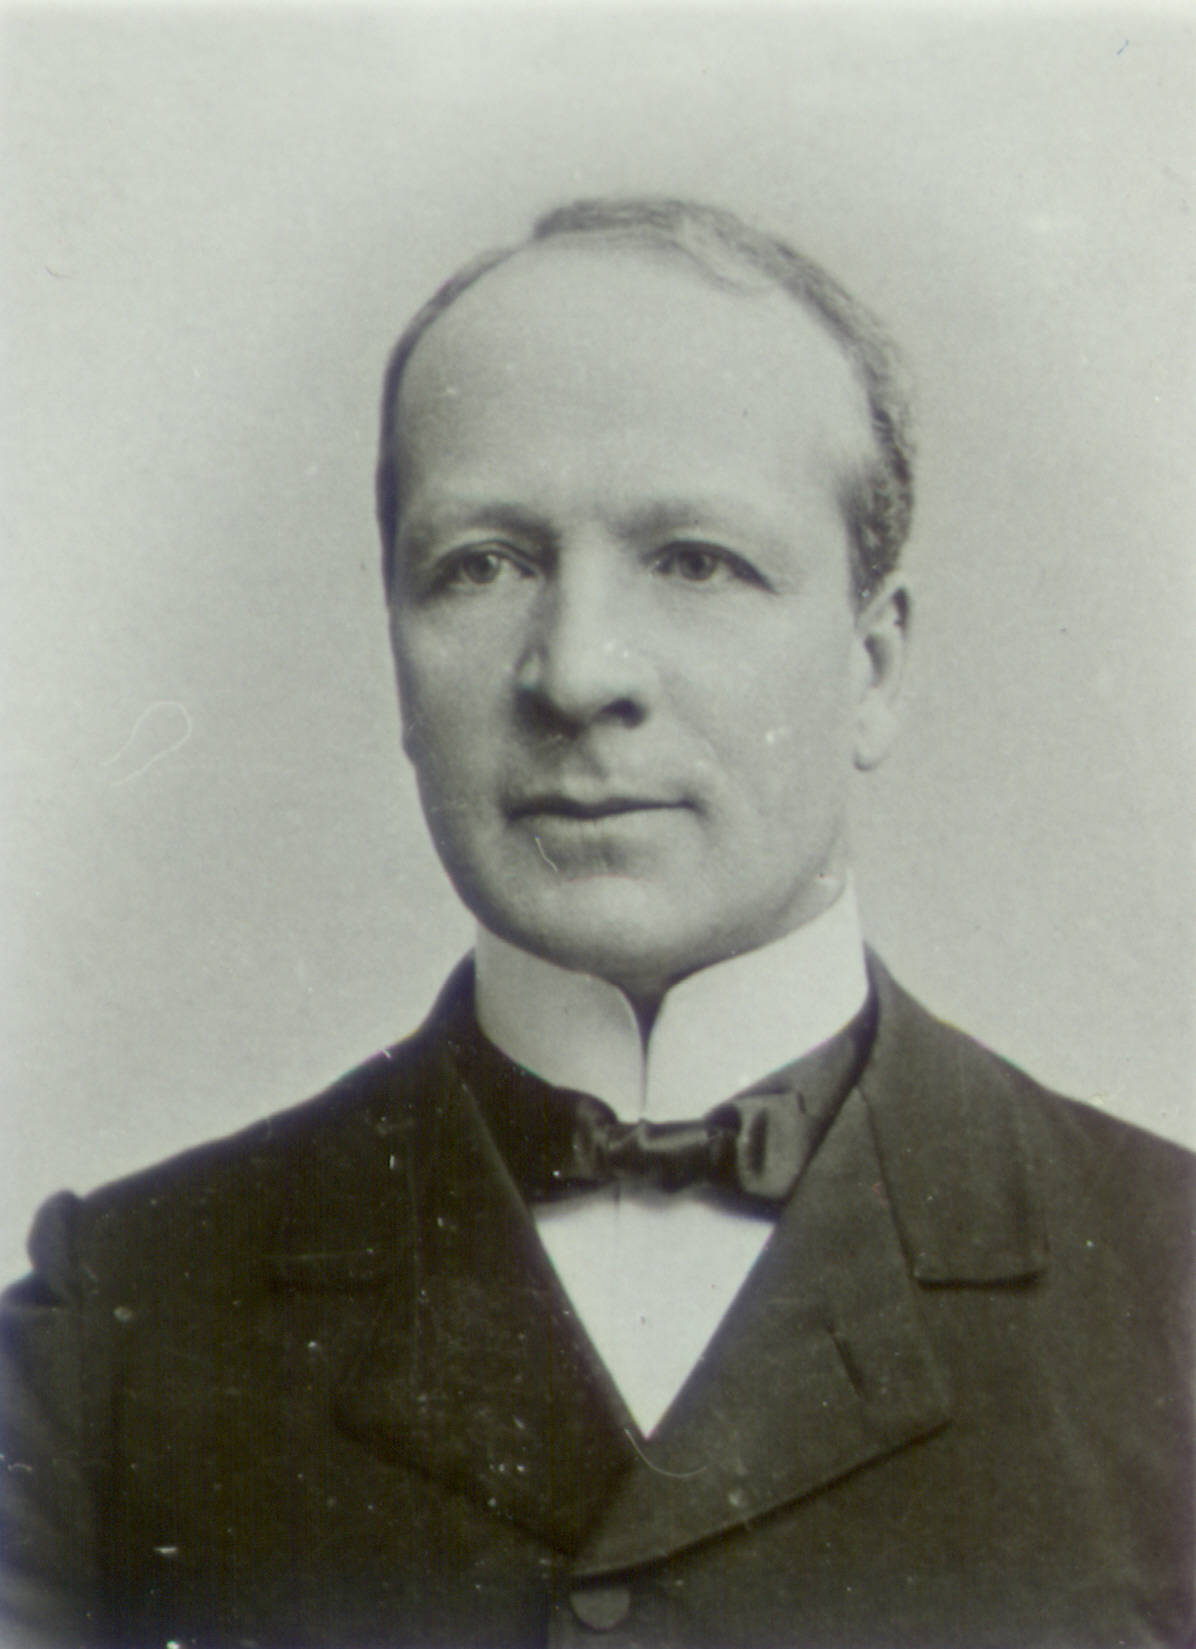 Hurren, James William David